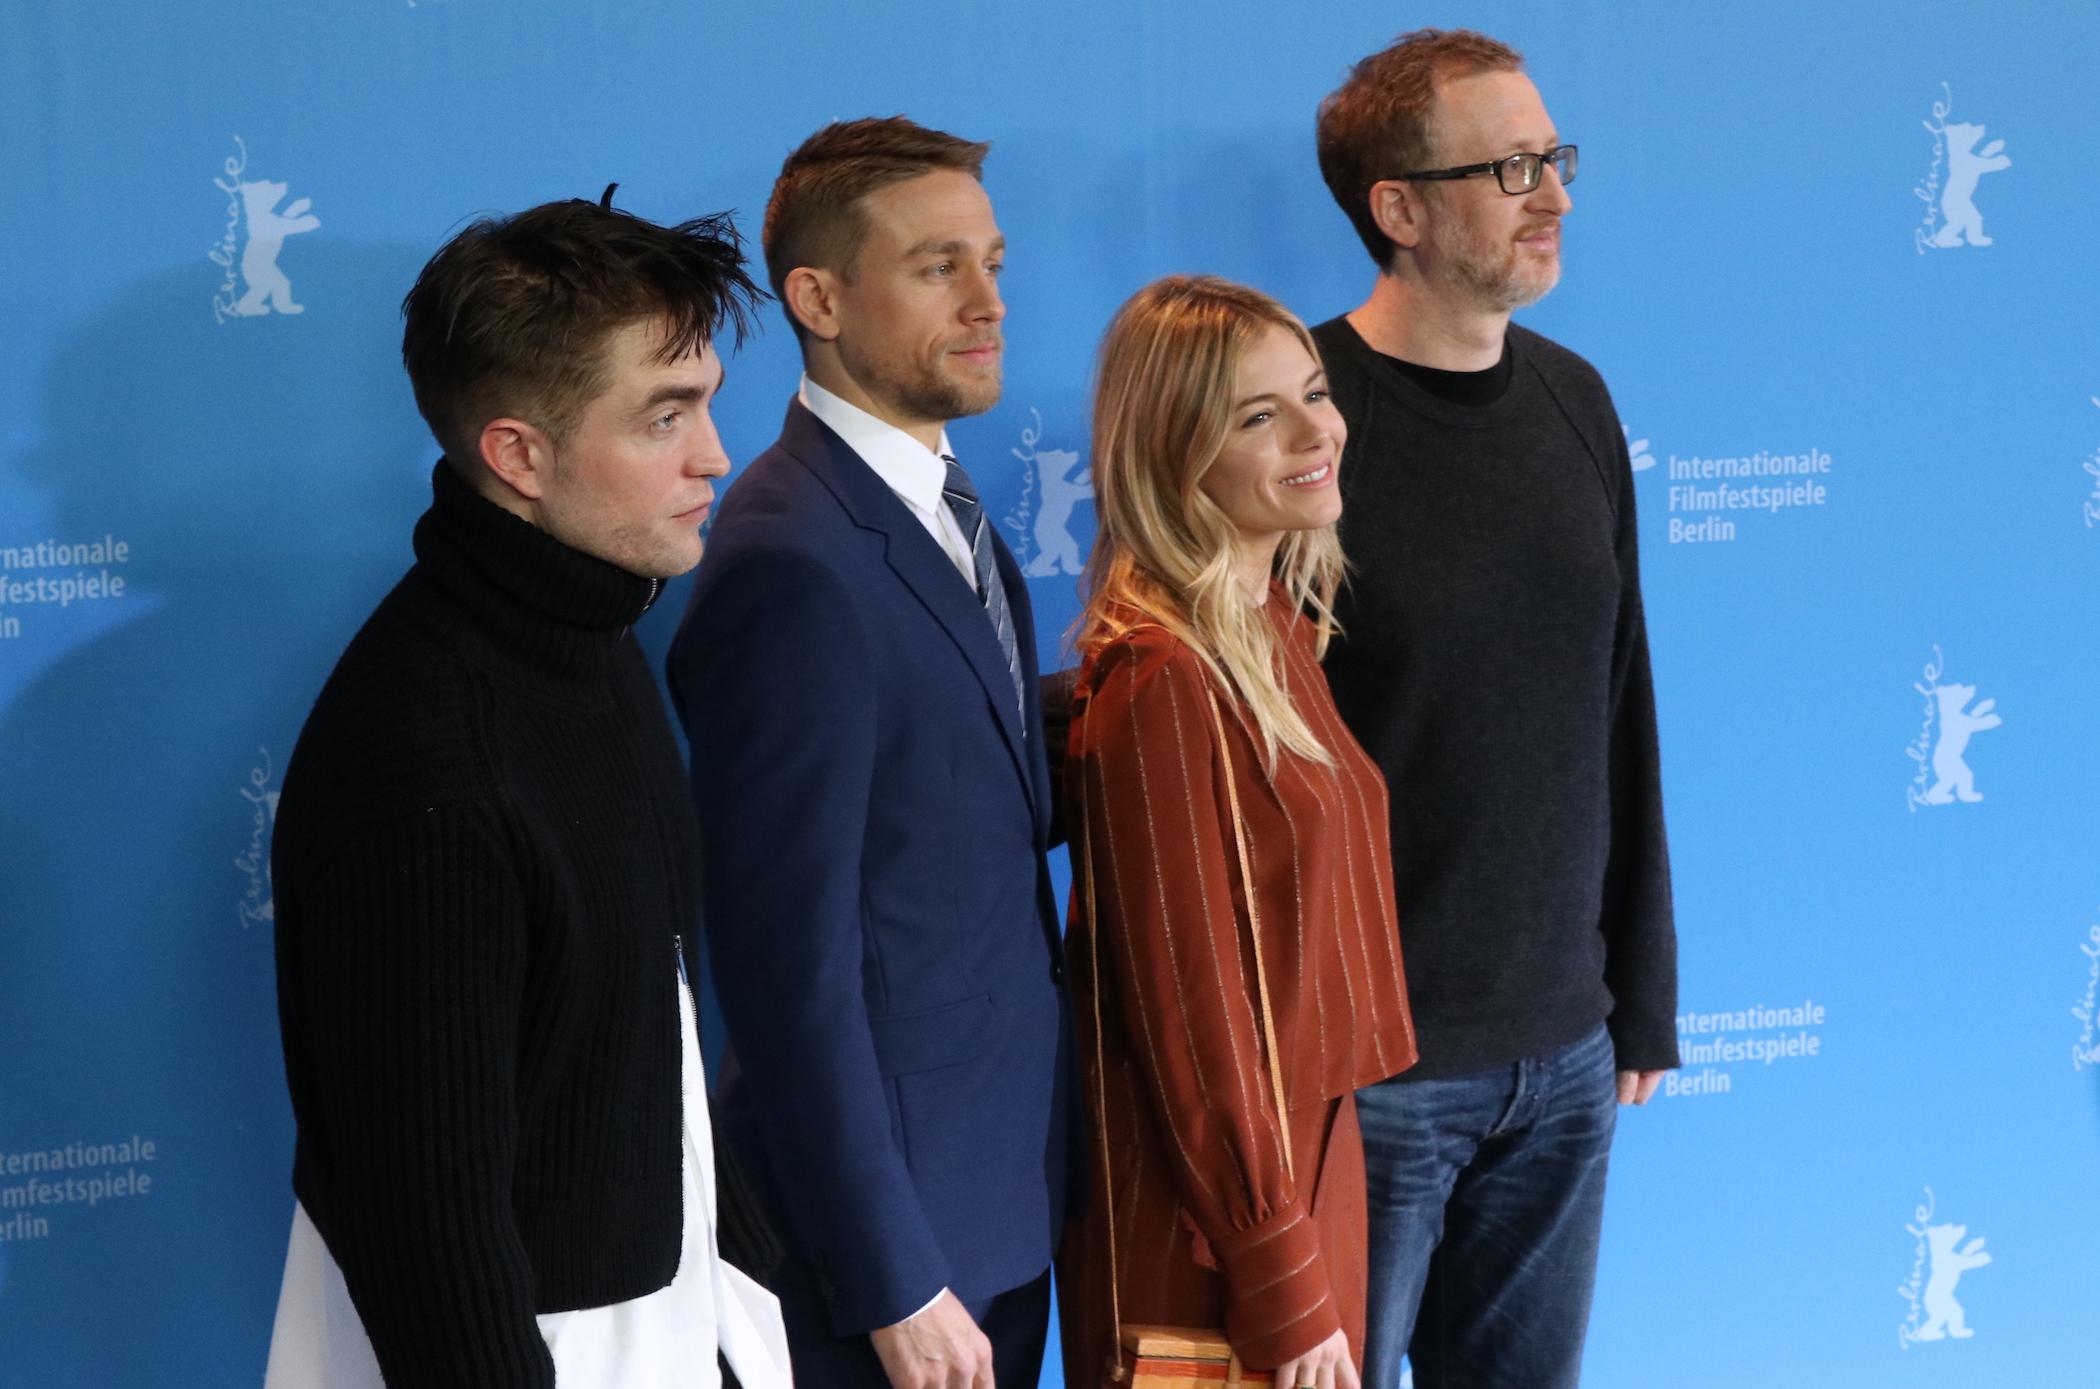 Berlino 2017: Robert Pattinson, Sienna Miller, Charlie Hunnam,  James Gray al photocall di Z - la città perduta